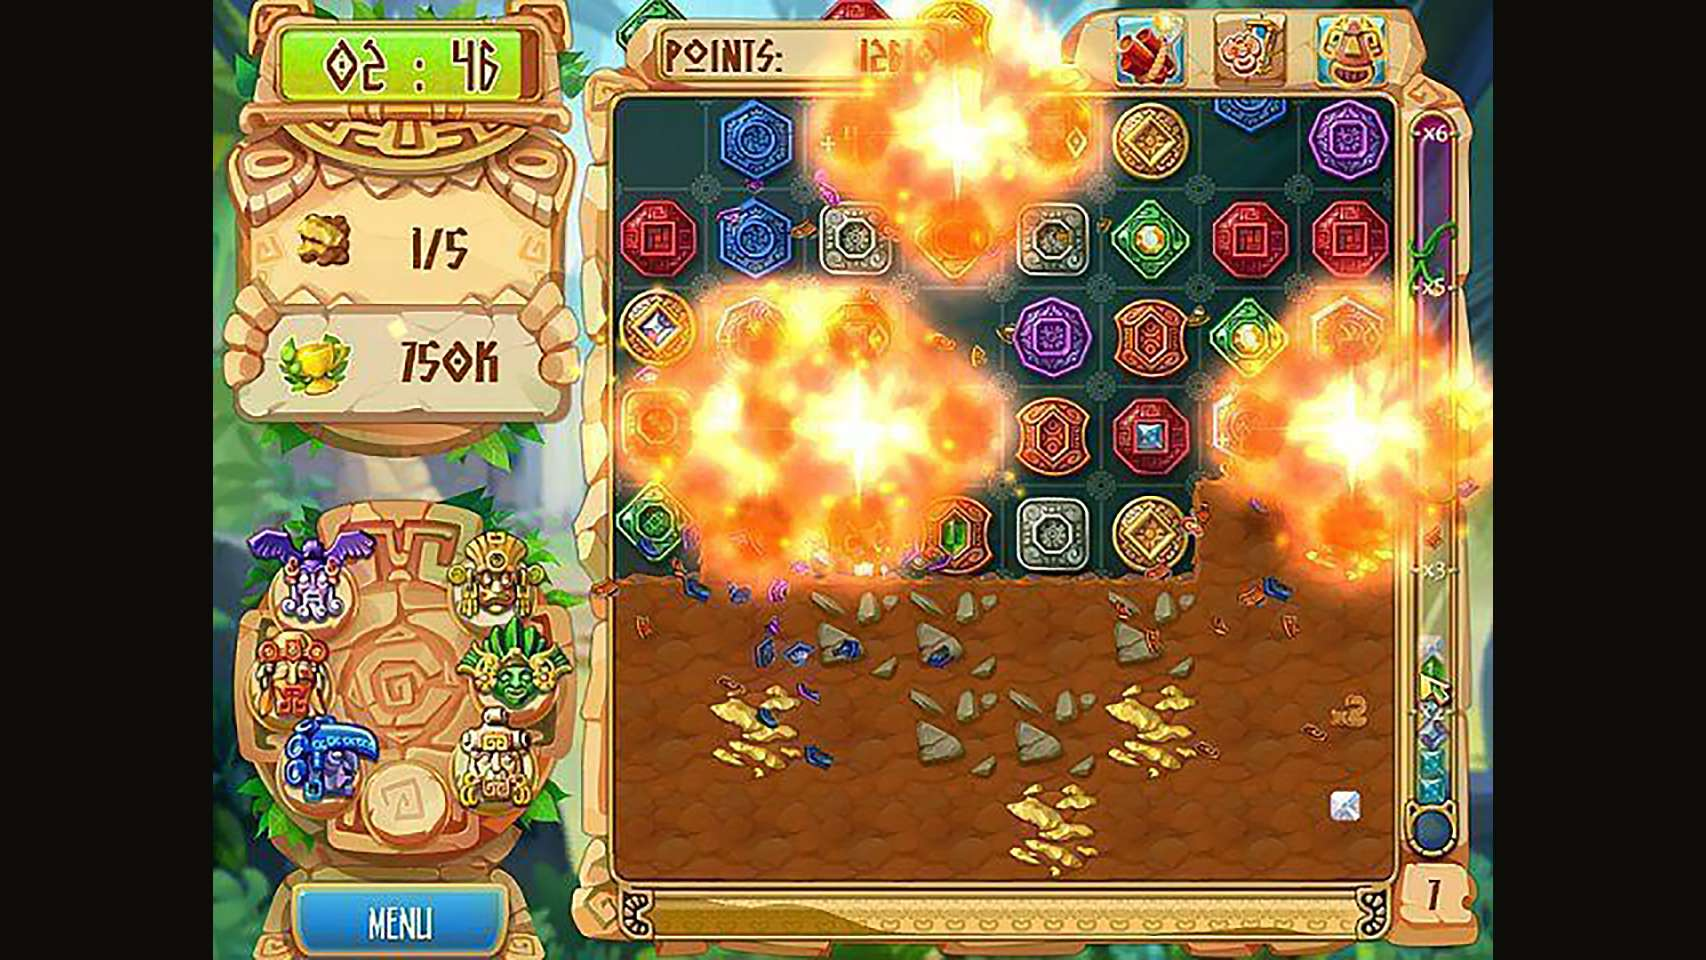 Screenshot from The Treasures of Montezuma 5 (4/7)